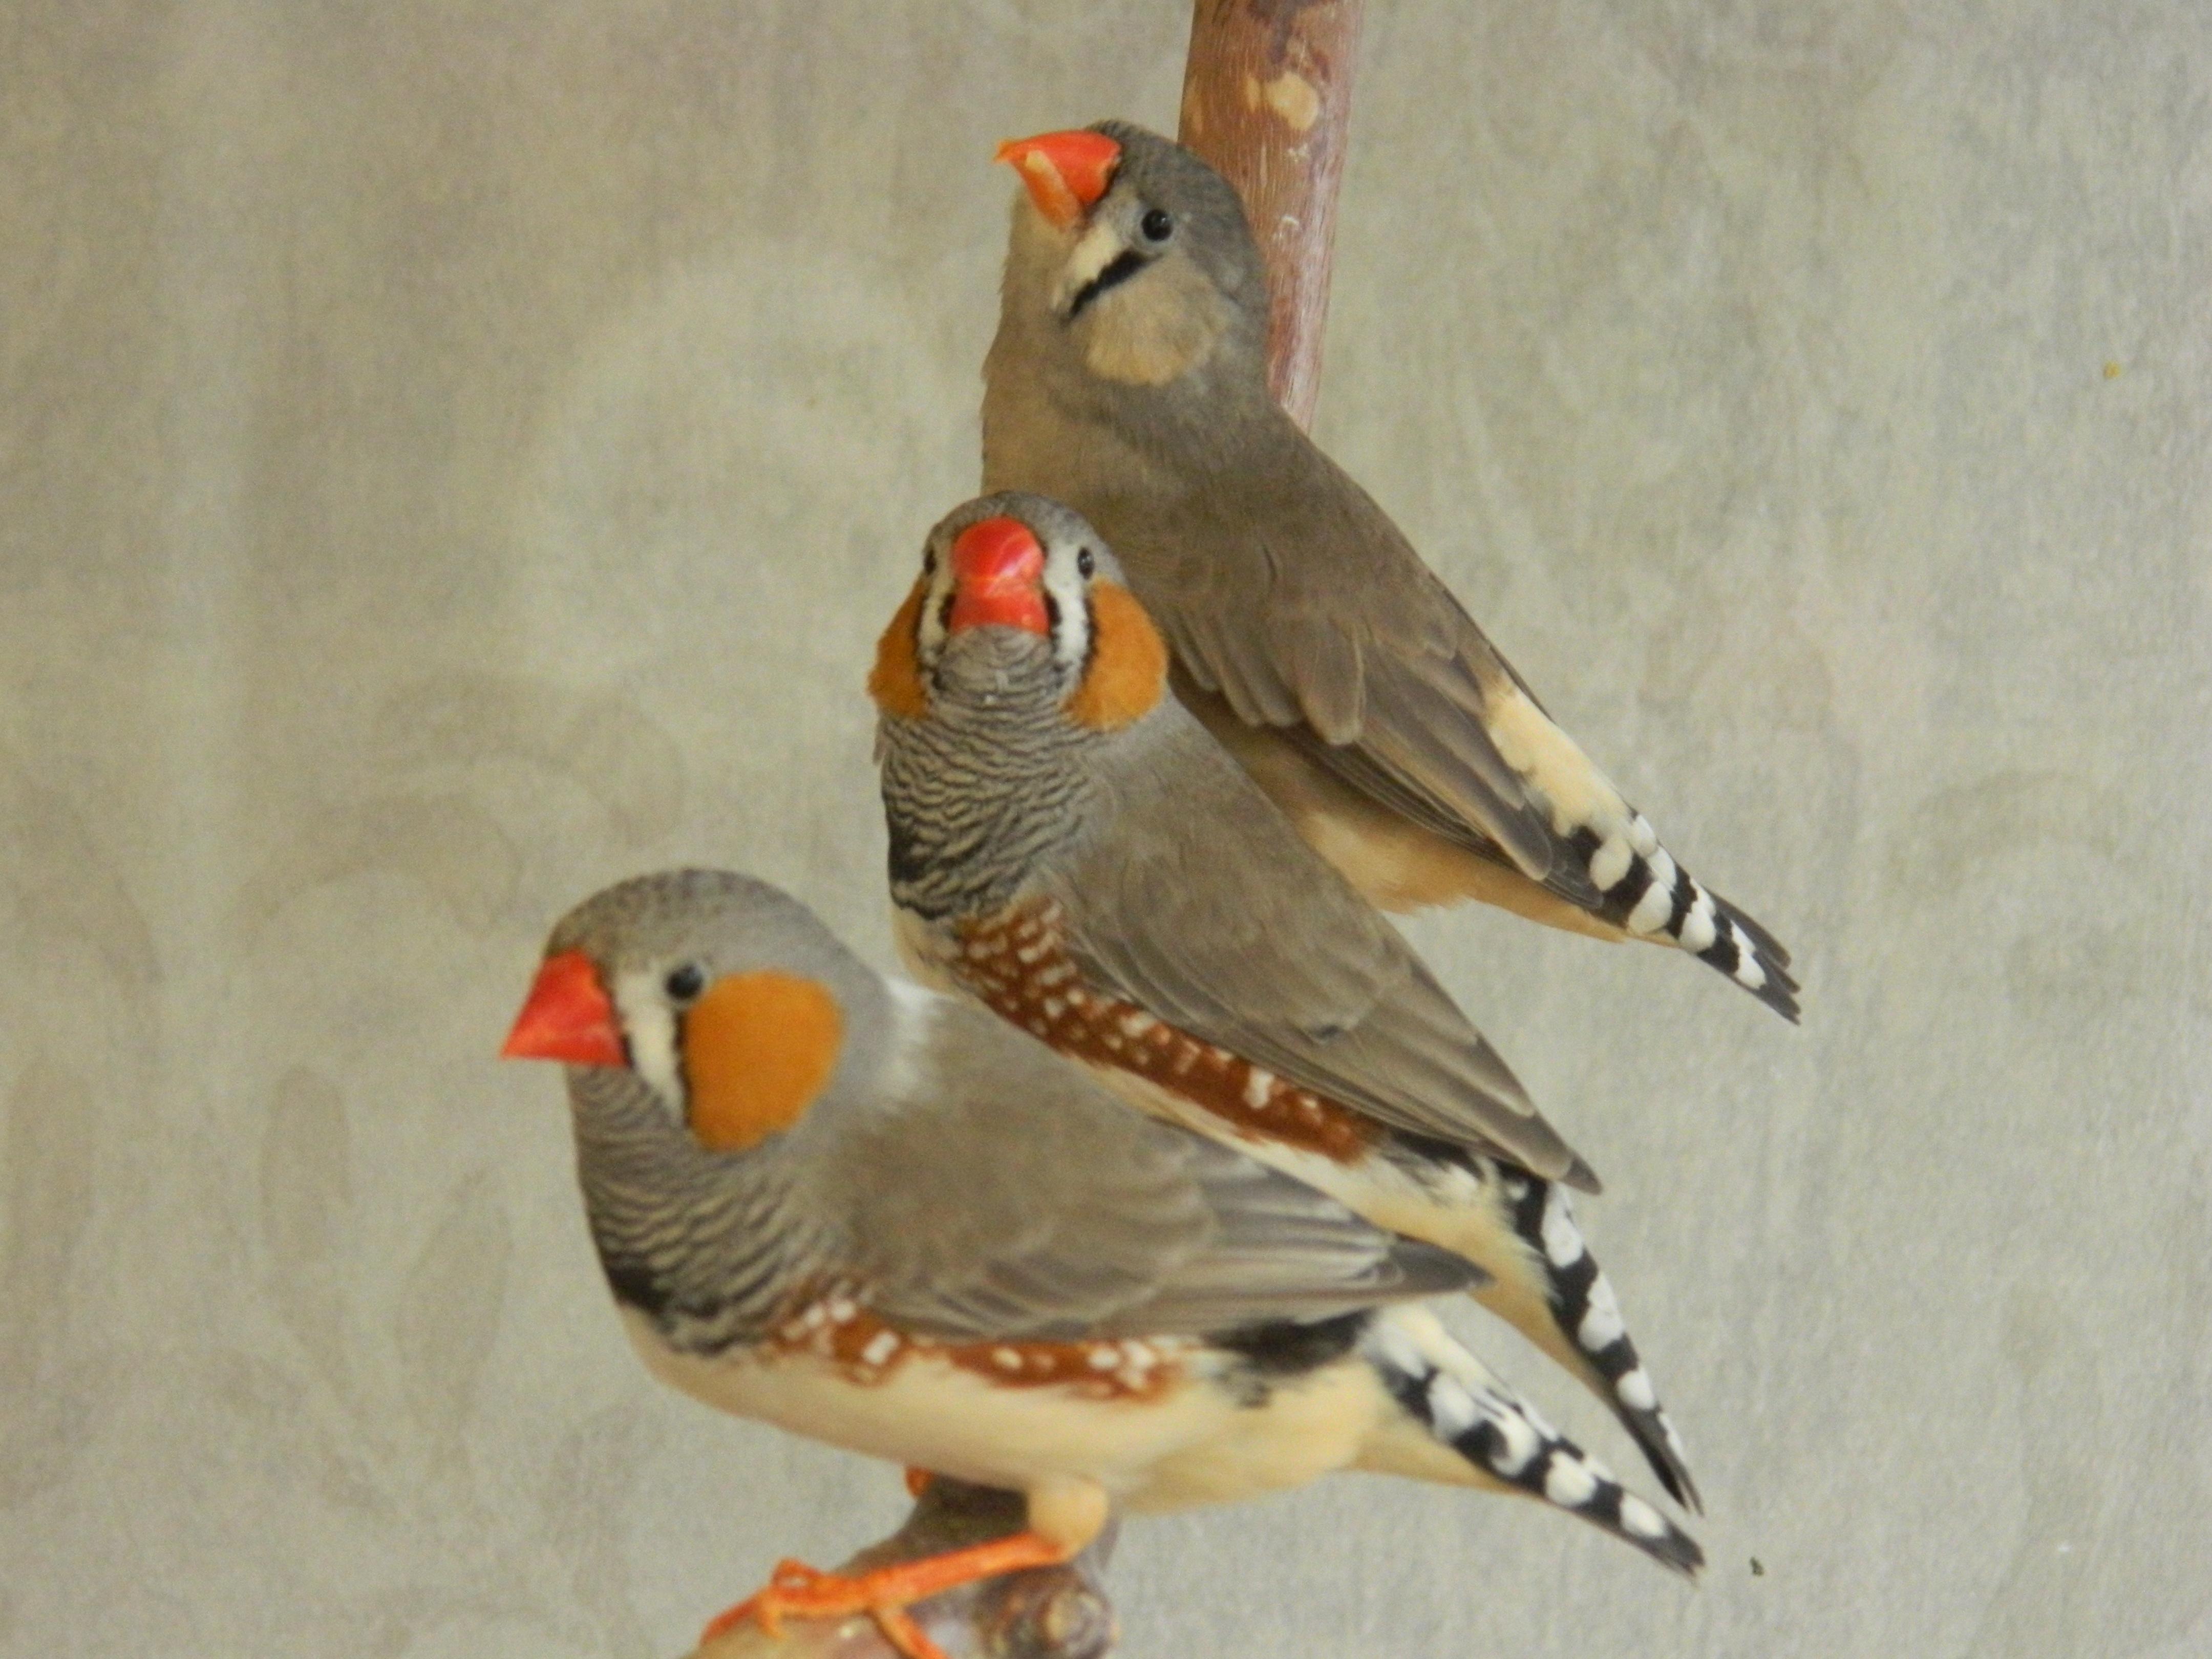 Orange beaked bird photo